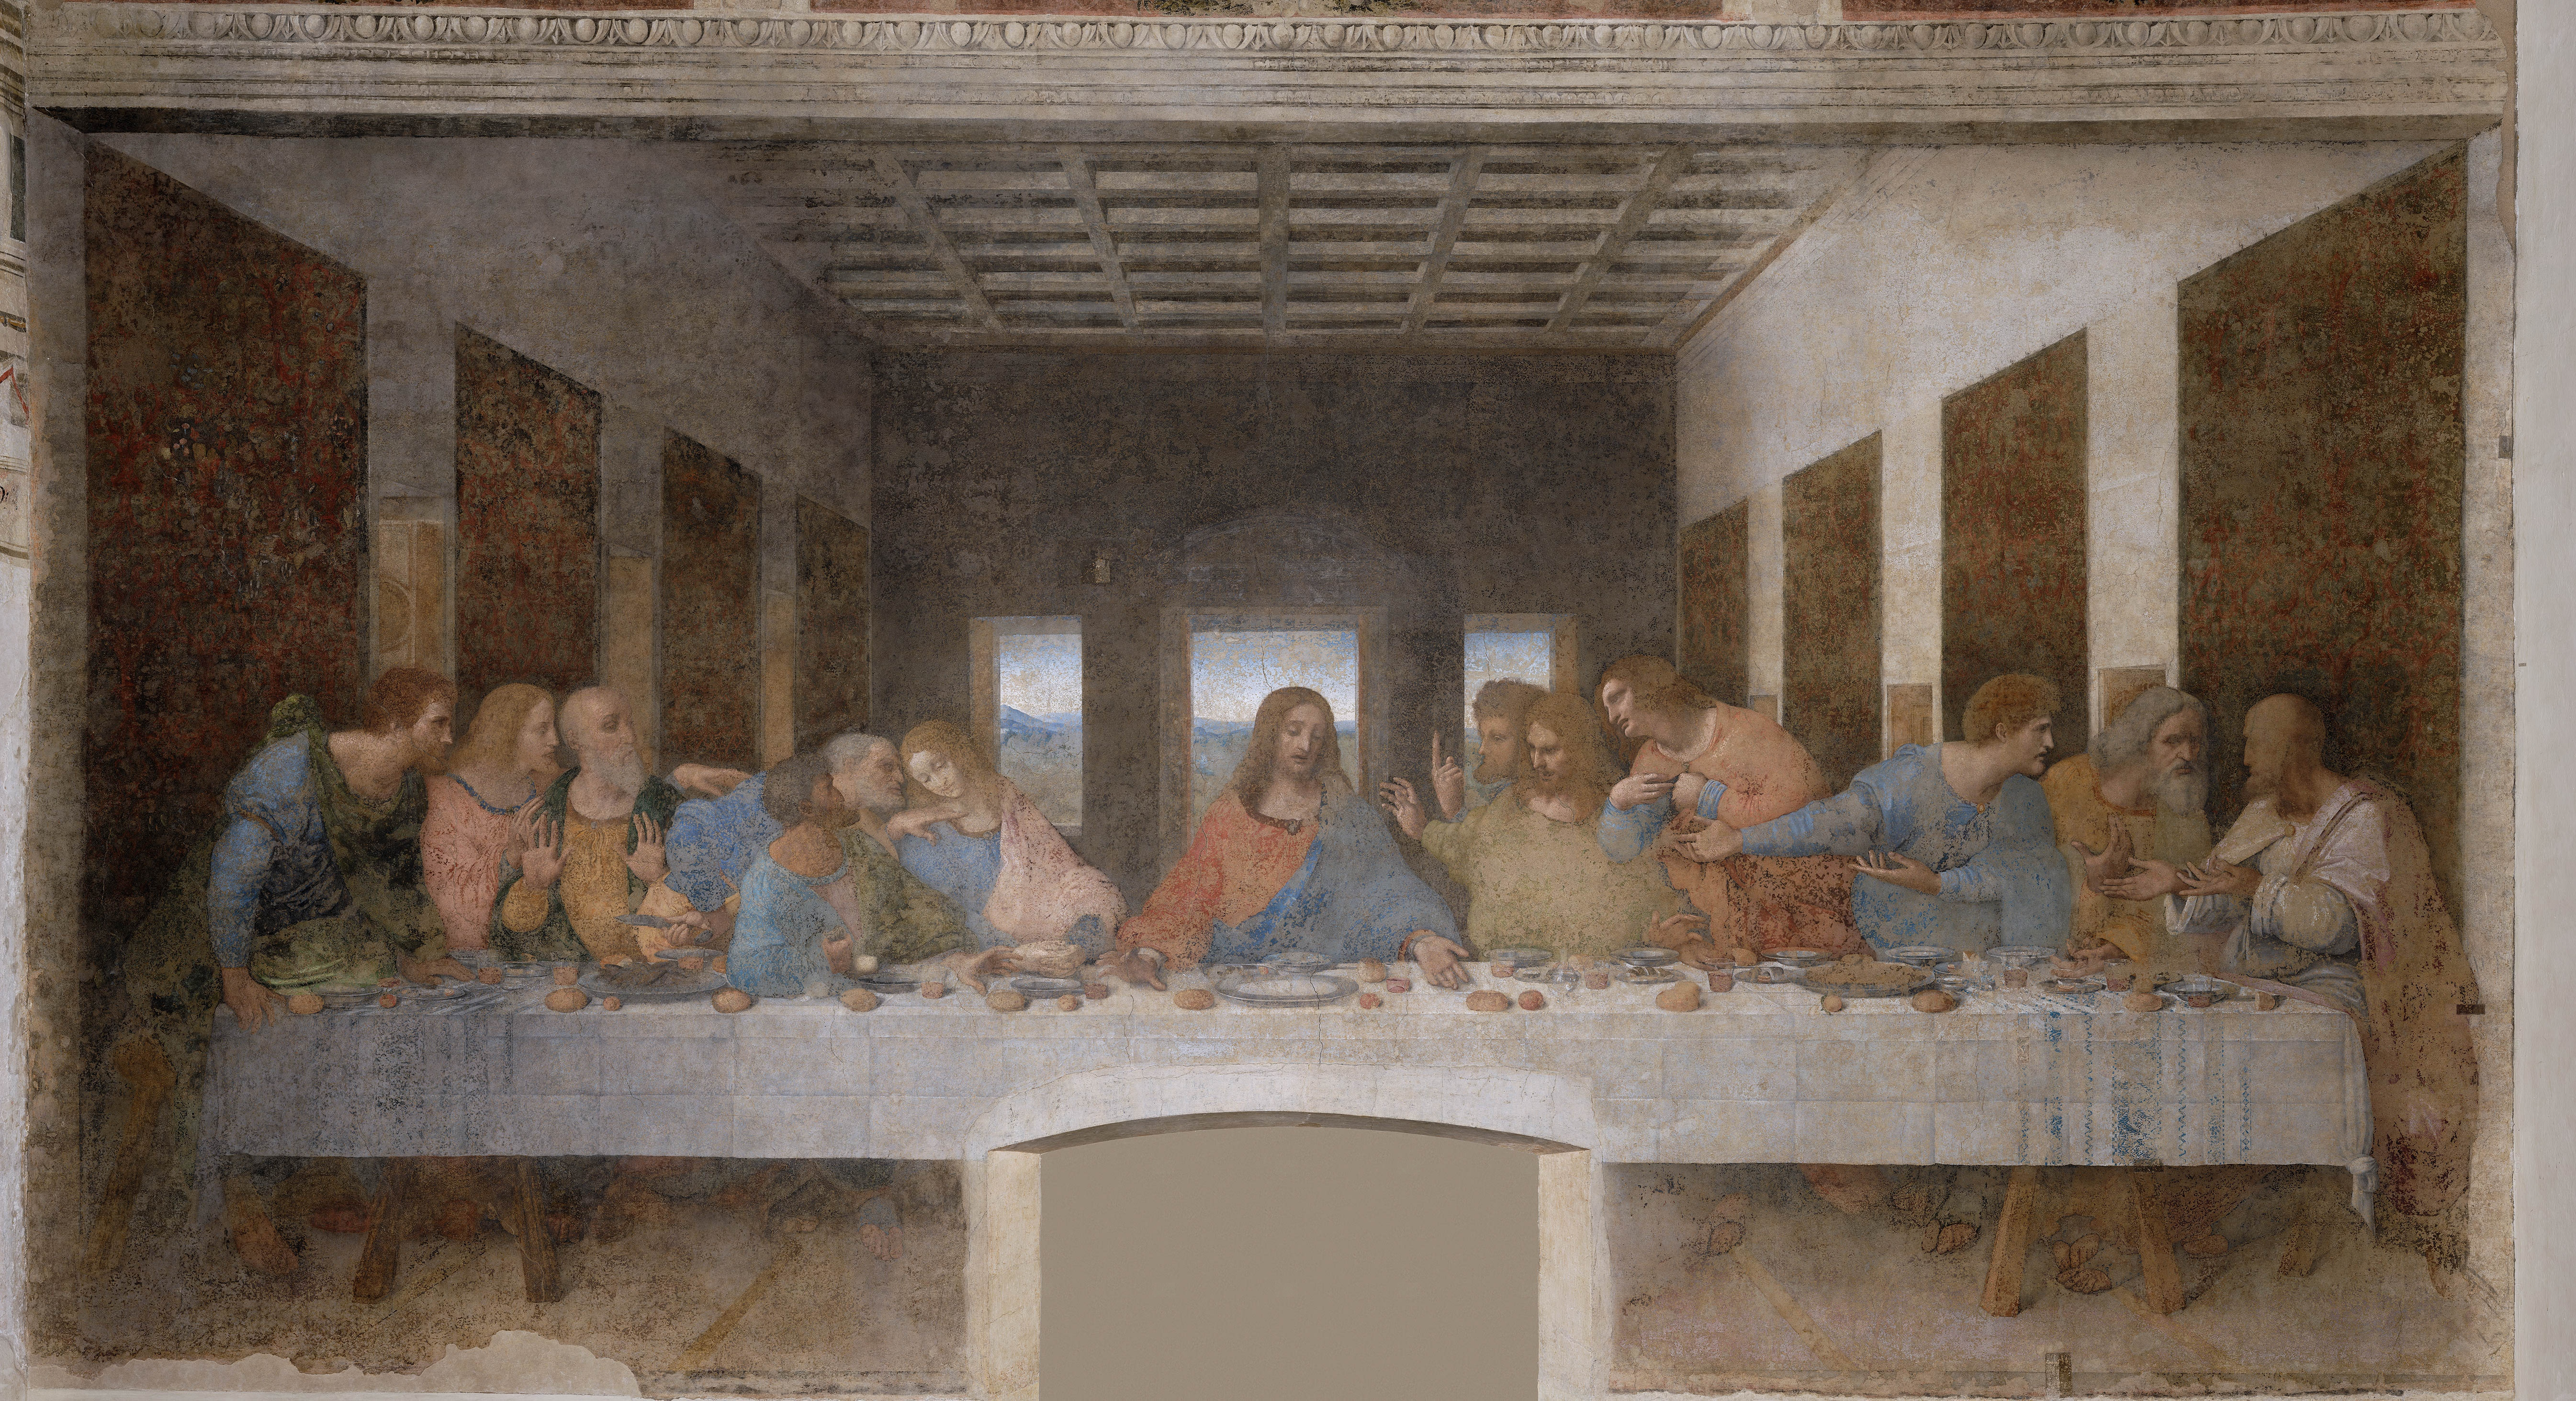 https://elniplex.files.wordpress.com/2013/04/la-ultima-cena-last-supper-leonardo-da-vinci-1495-98.jpg